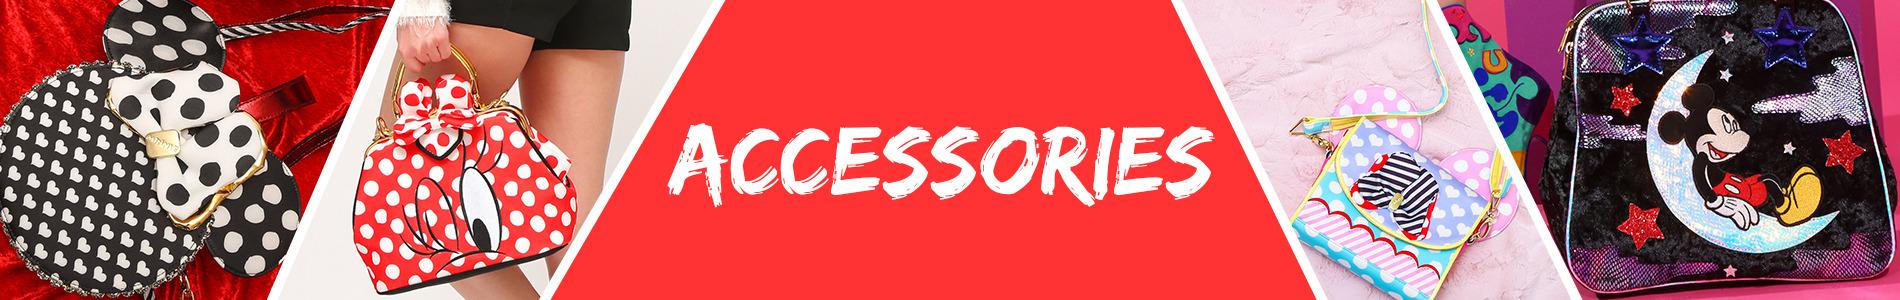 Accessories | Tiltedsole.com